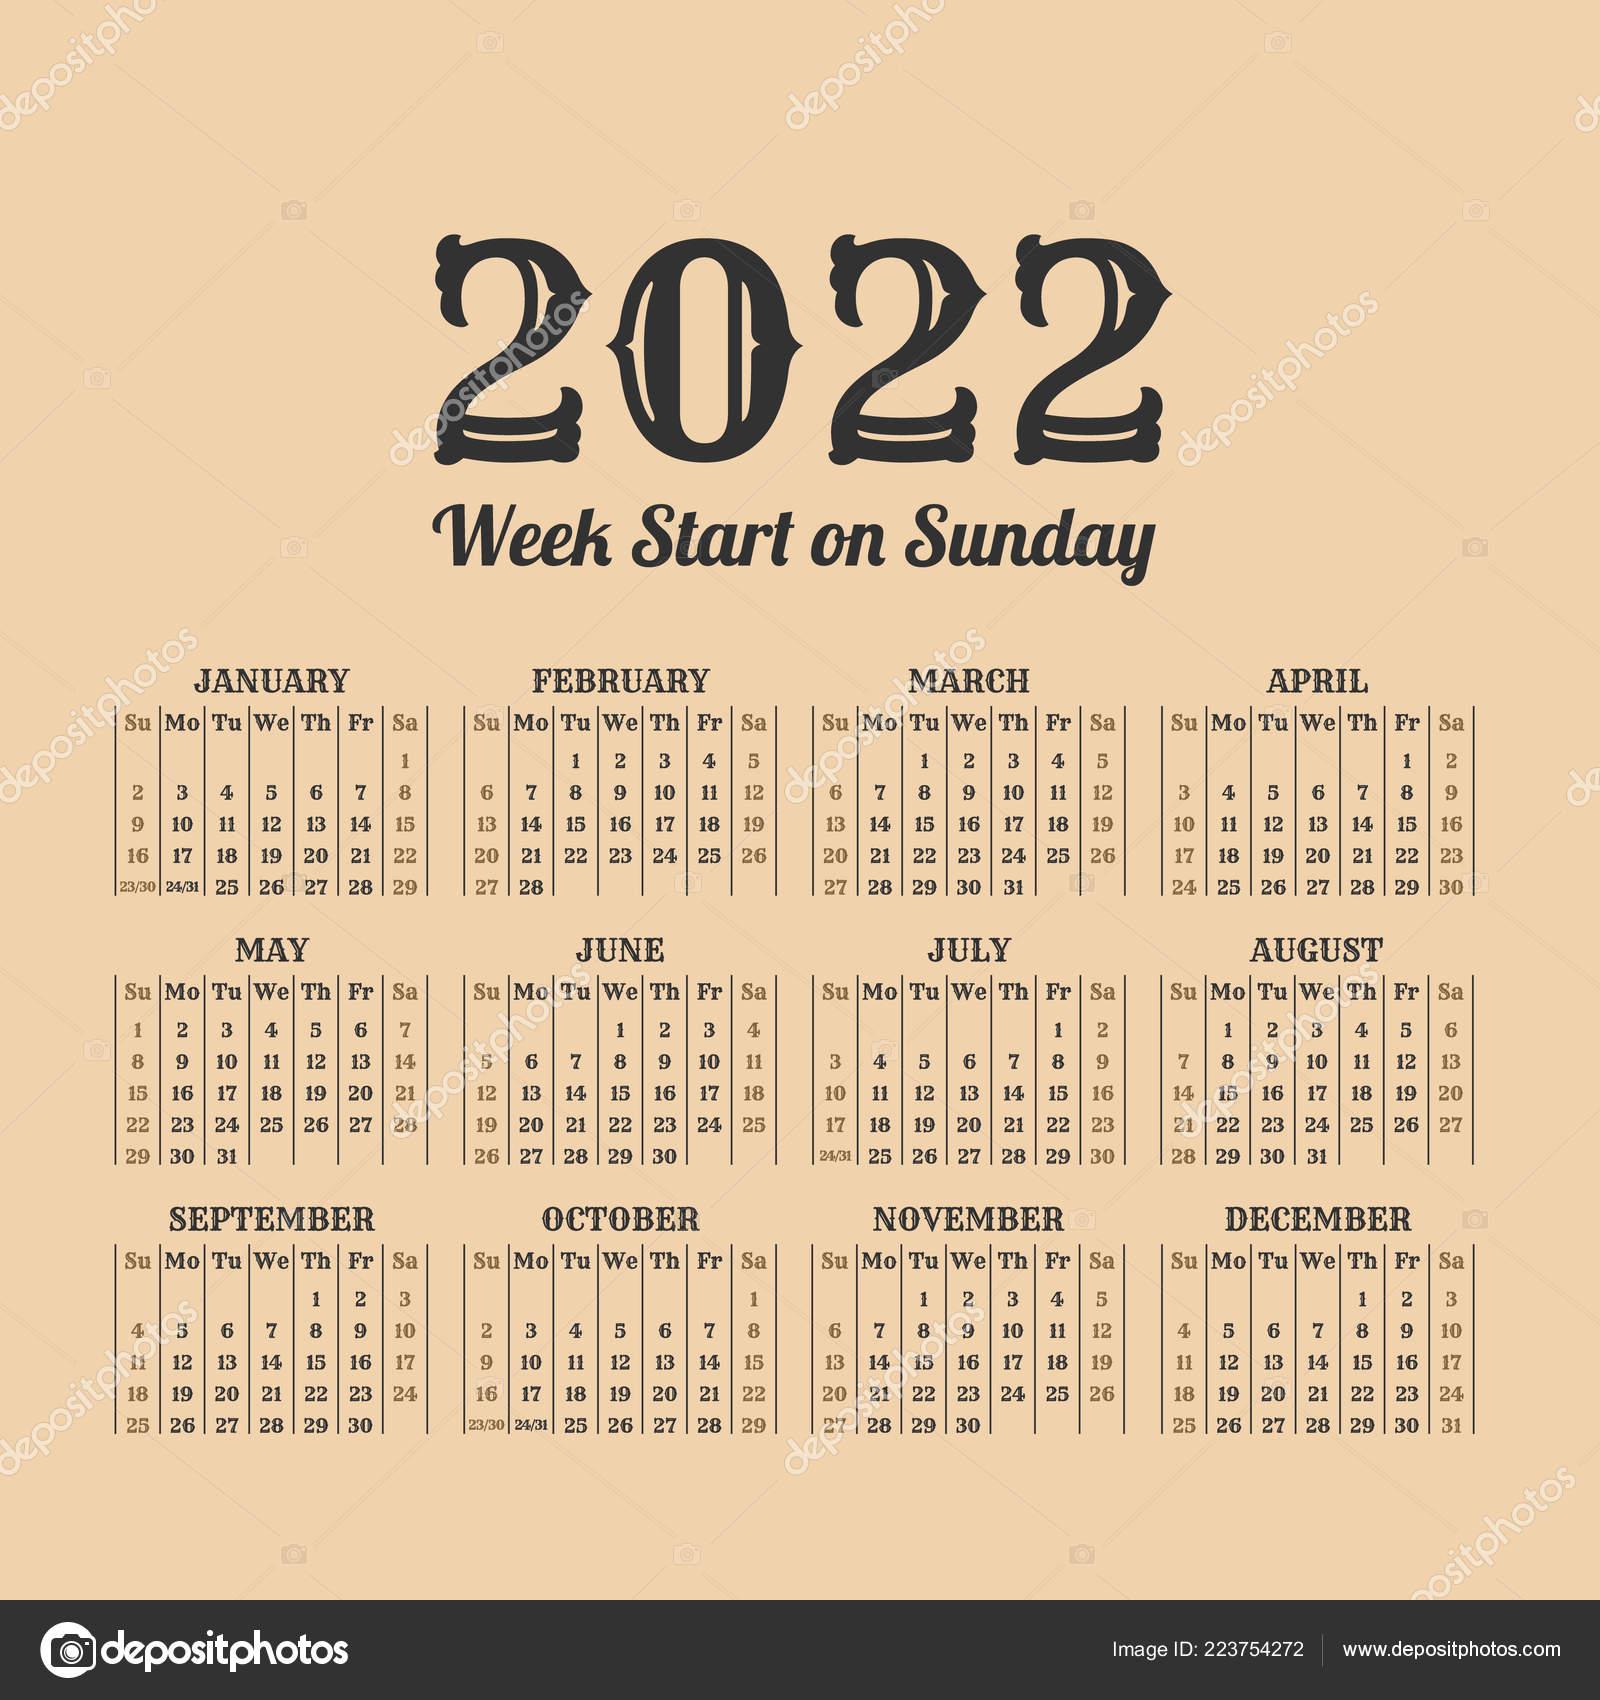 2022 Weeks Calendar.2022 Year Vintage Calendar Weeks Start On Sunday Vector Image By C 123sasha Vector Stock 223754272